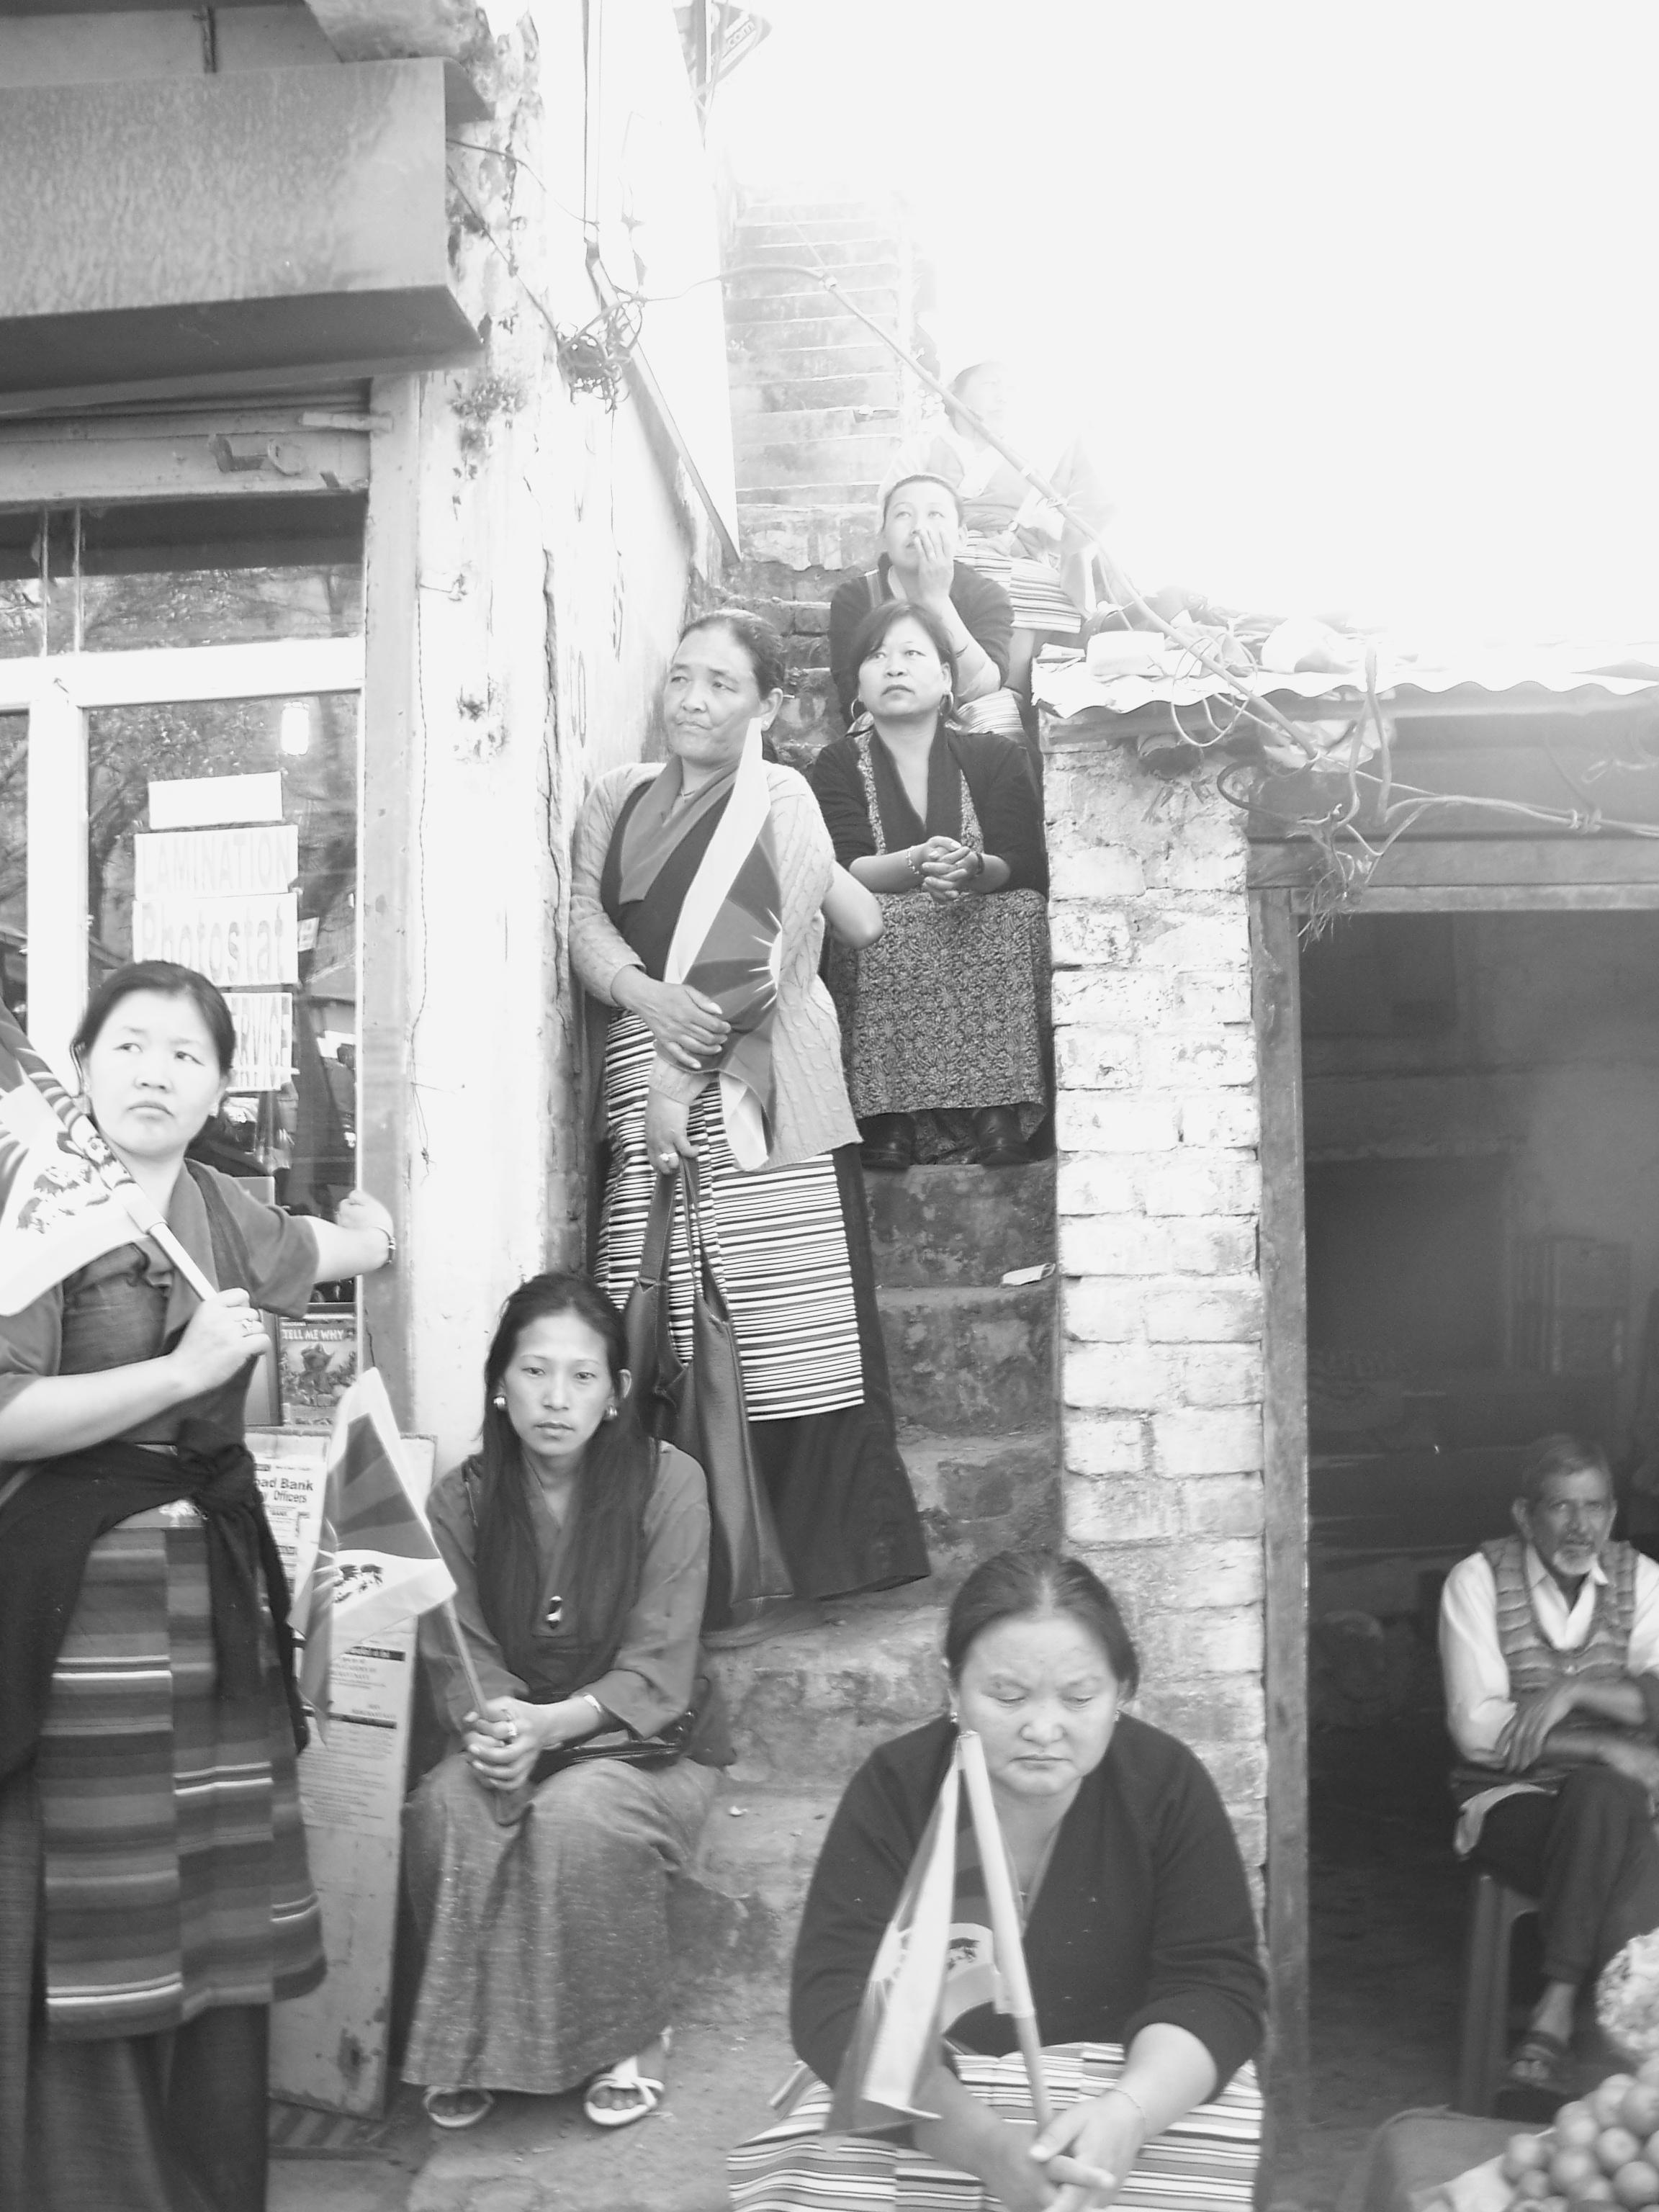 201_1895 Jonathan Machler, Tibétains à Dharamsala, Copyright